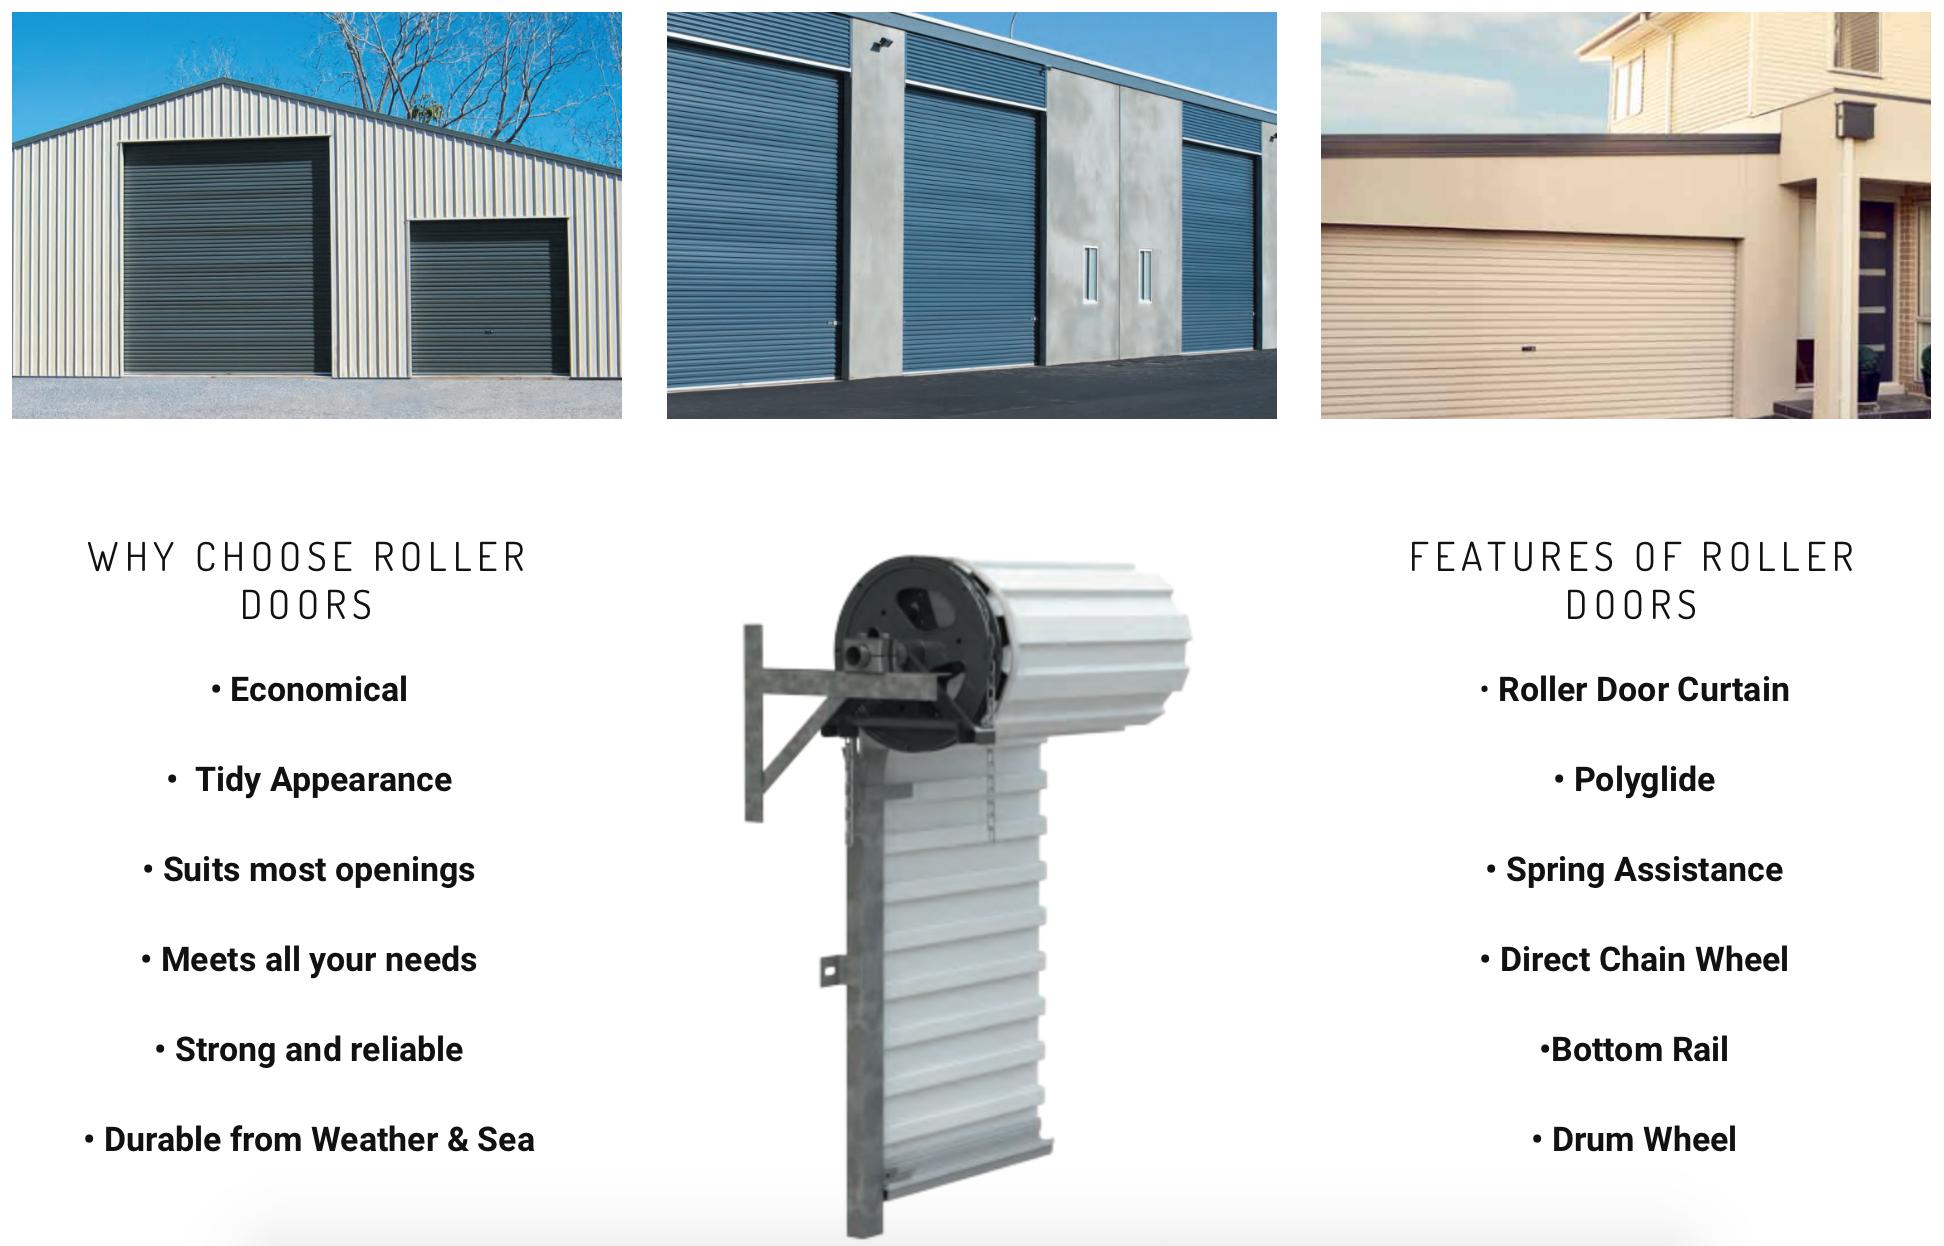 MAKO Installations Murwillumbah Northern Rivers NSW Roller Garage Door Specialists Replacement New Service Residential Commercial Industrial.png